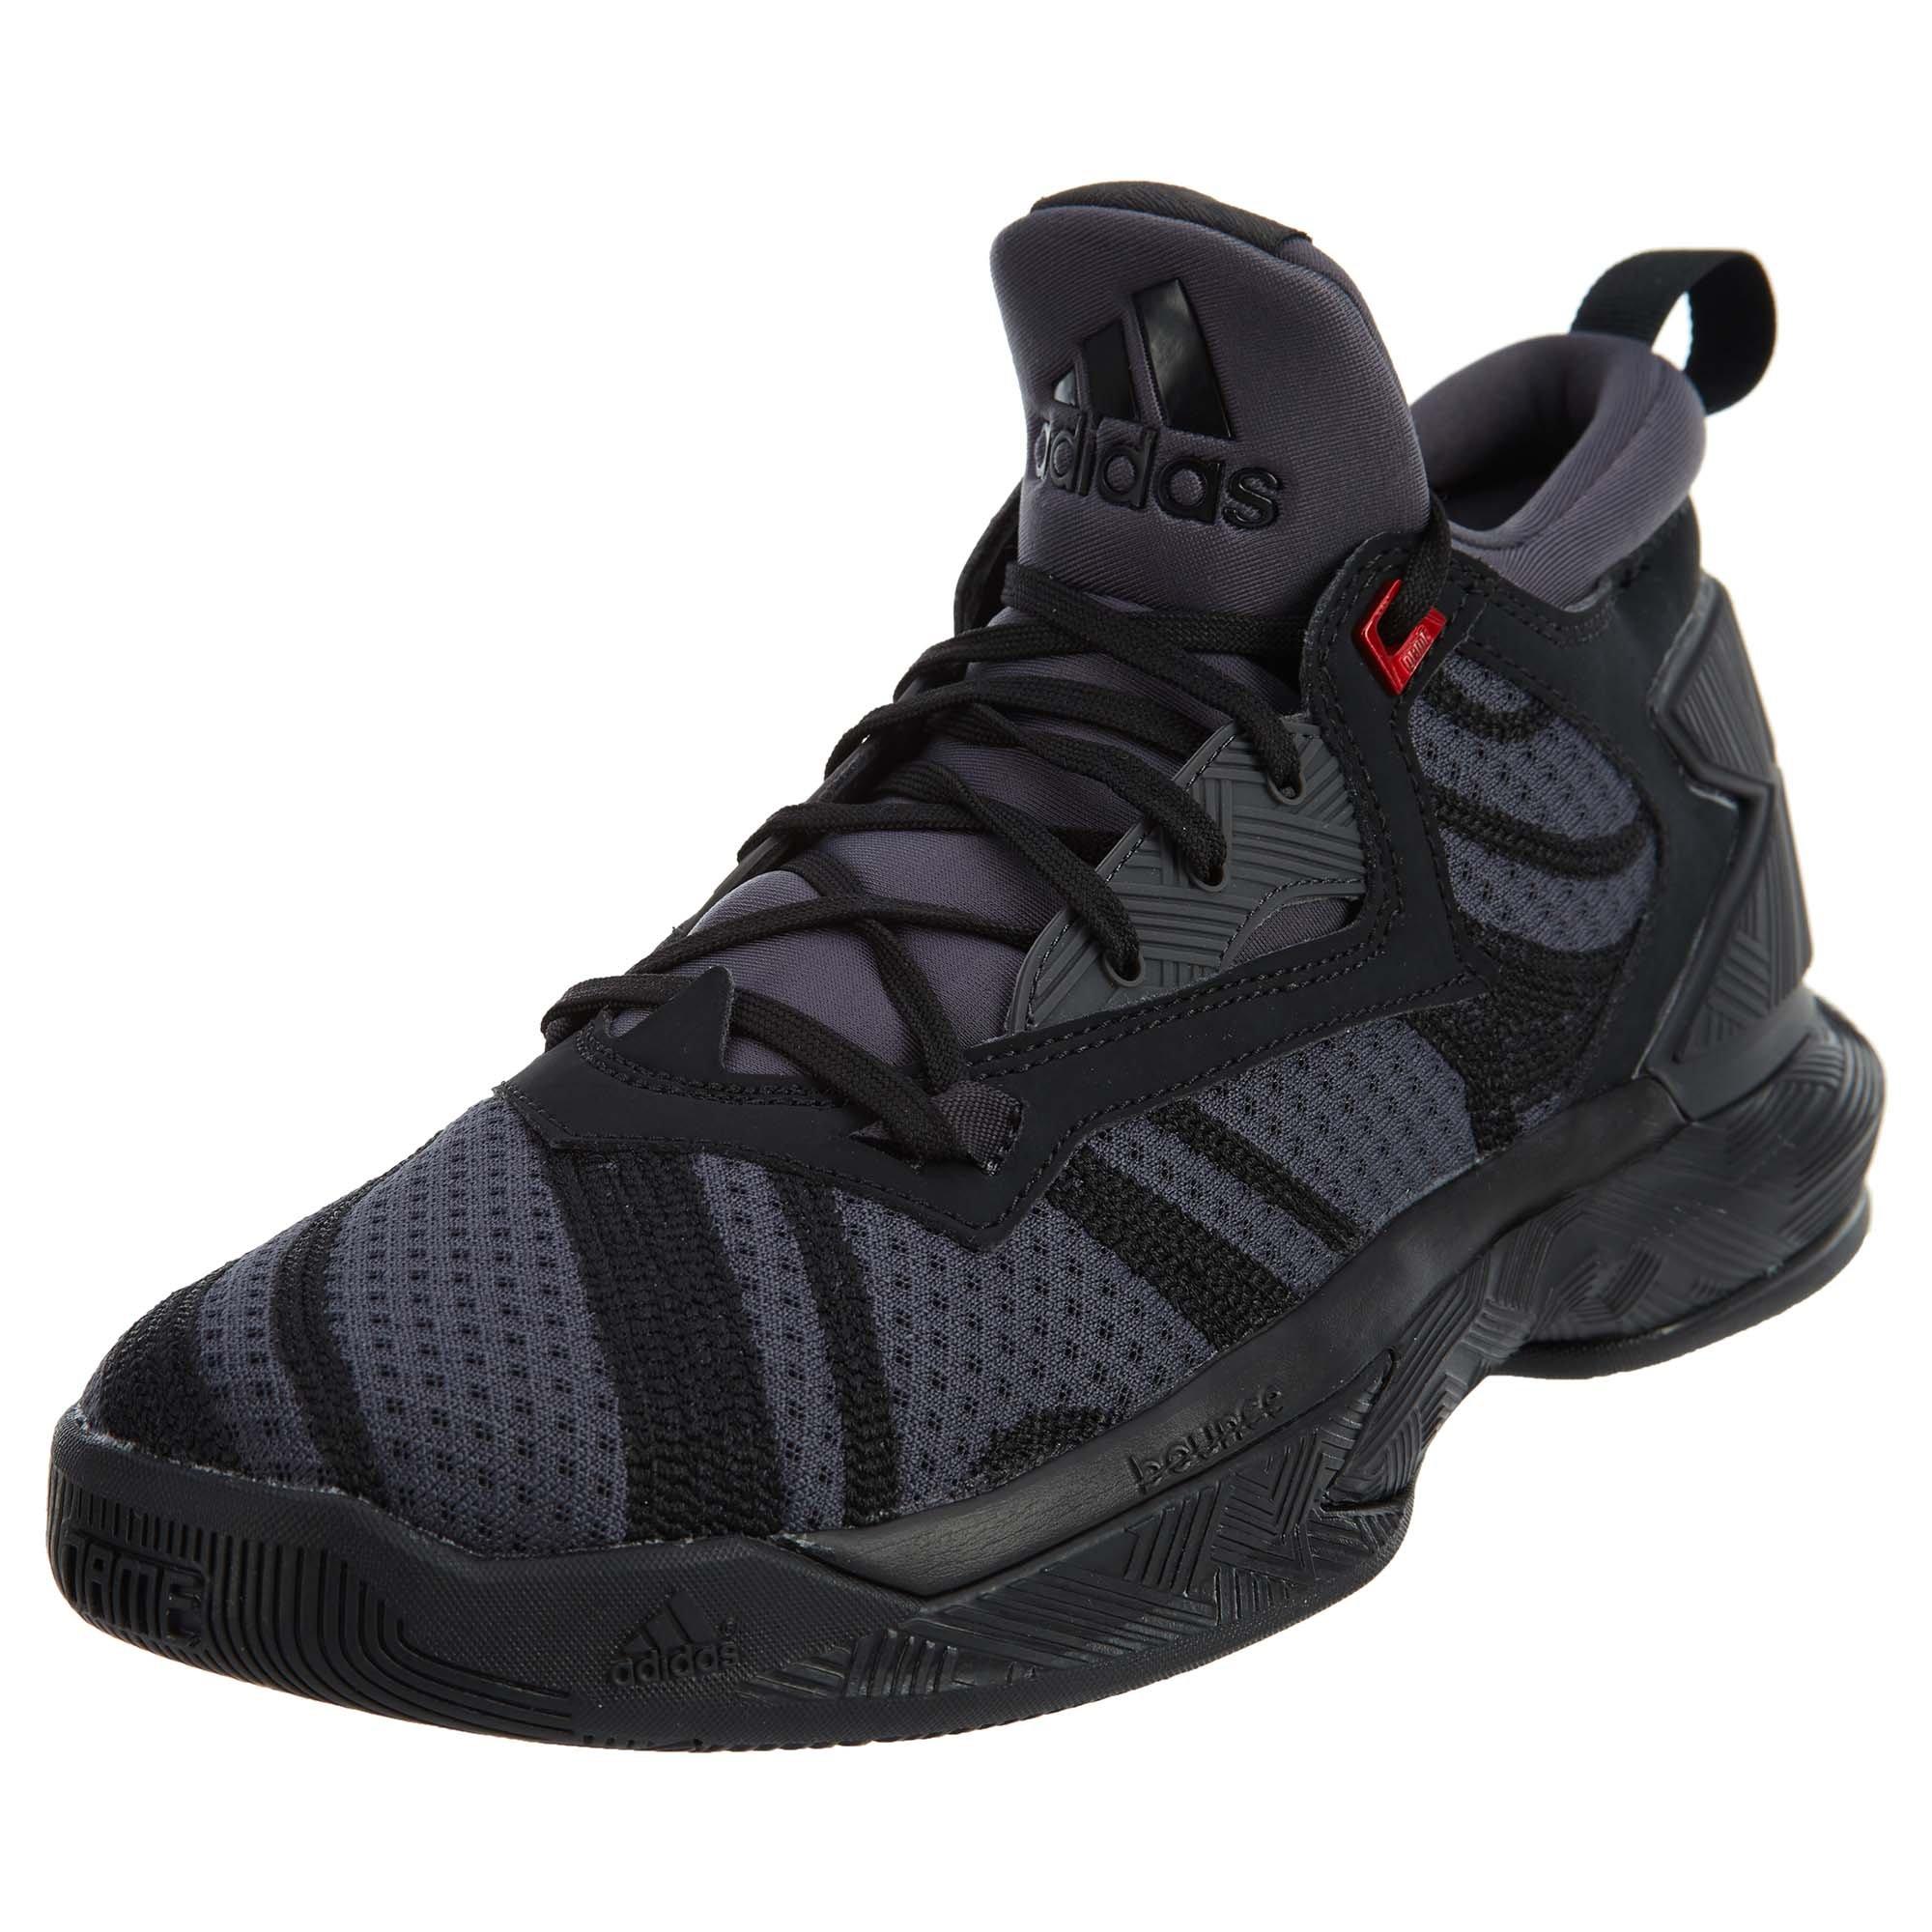 size 40 967c0 c36f7 Galleon - Adidas D Lillard 2 Basketball Shoe - Black - Mens - 7.5